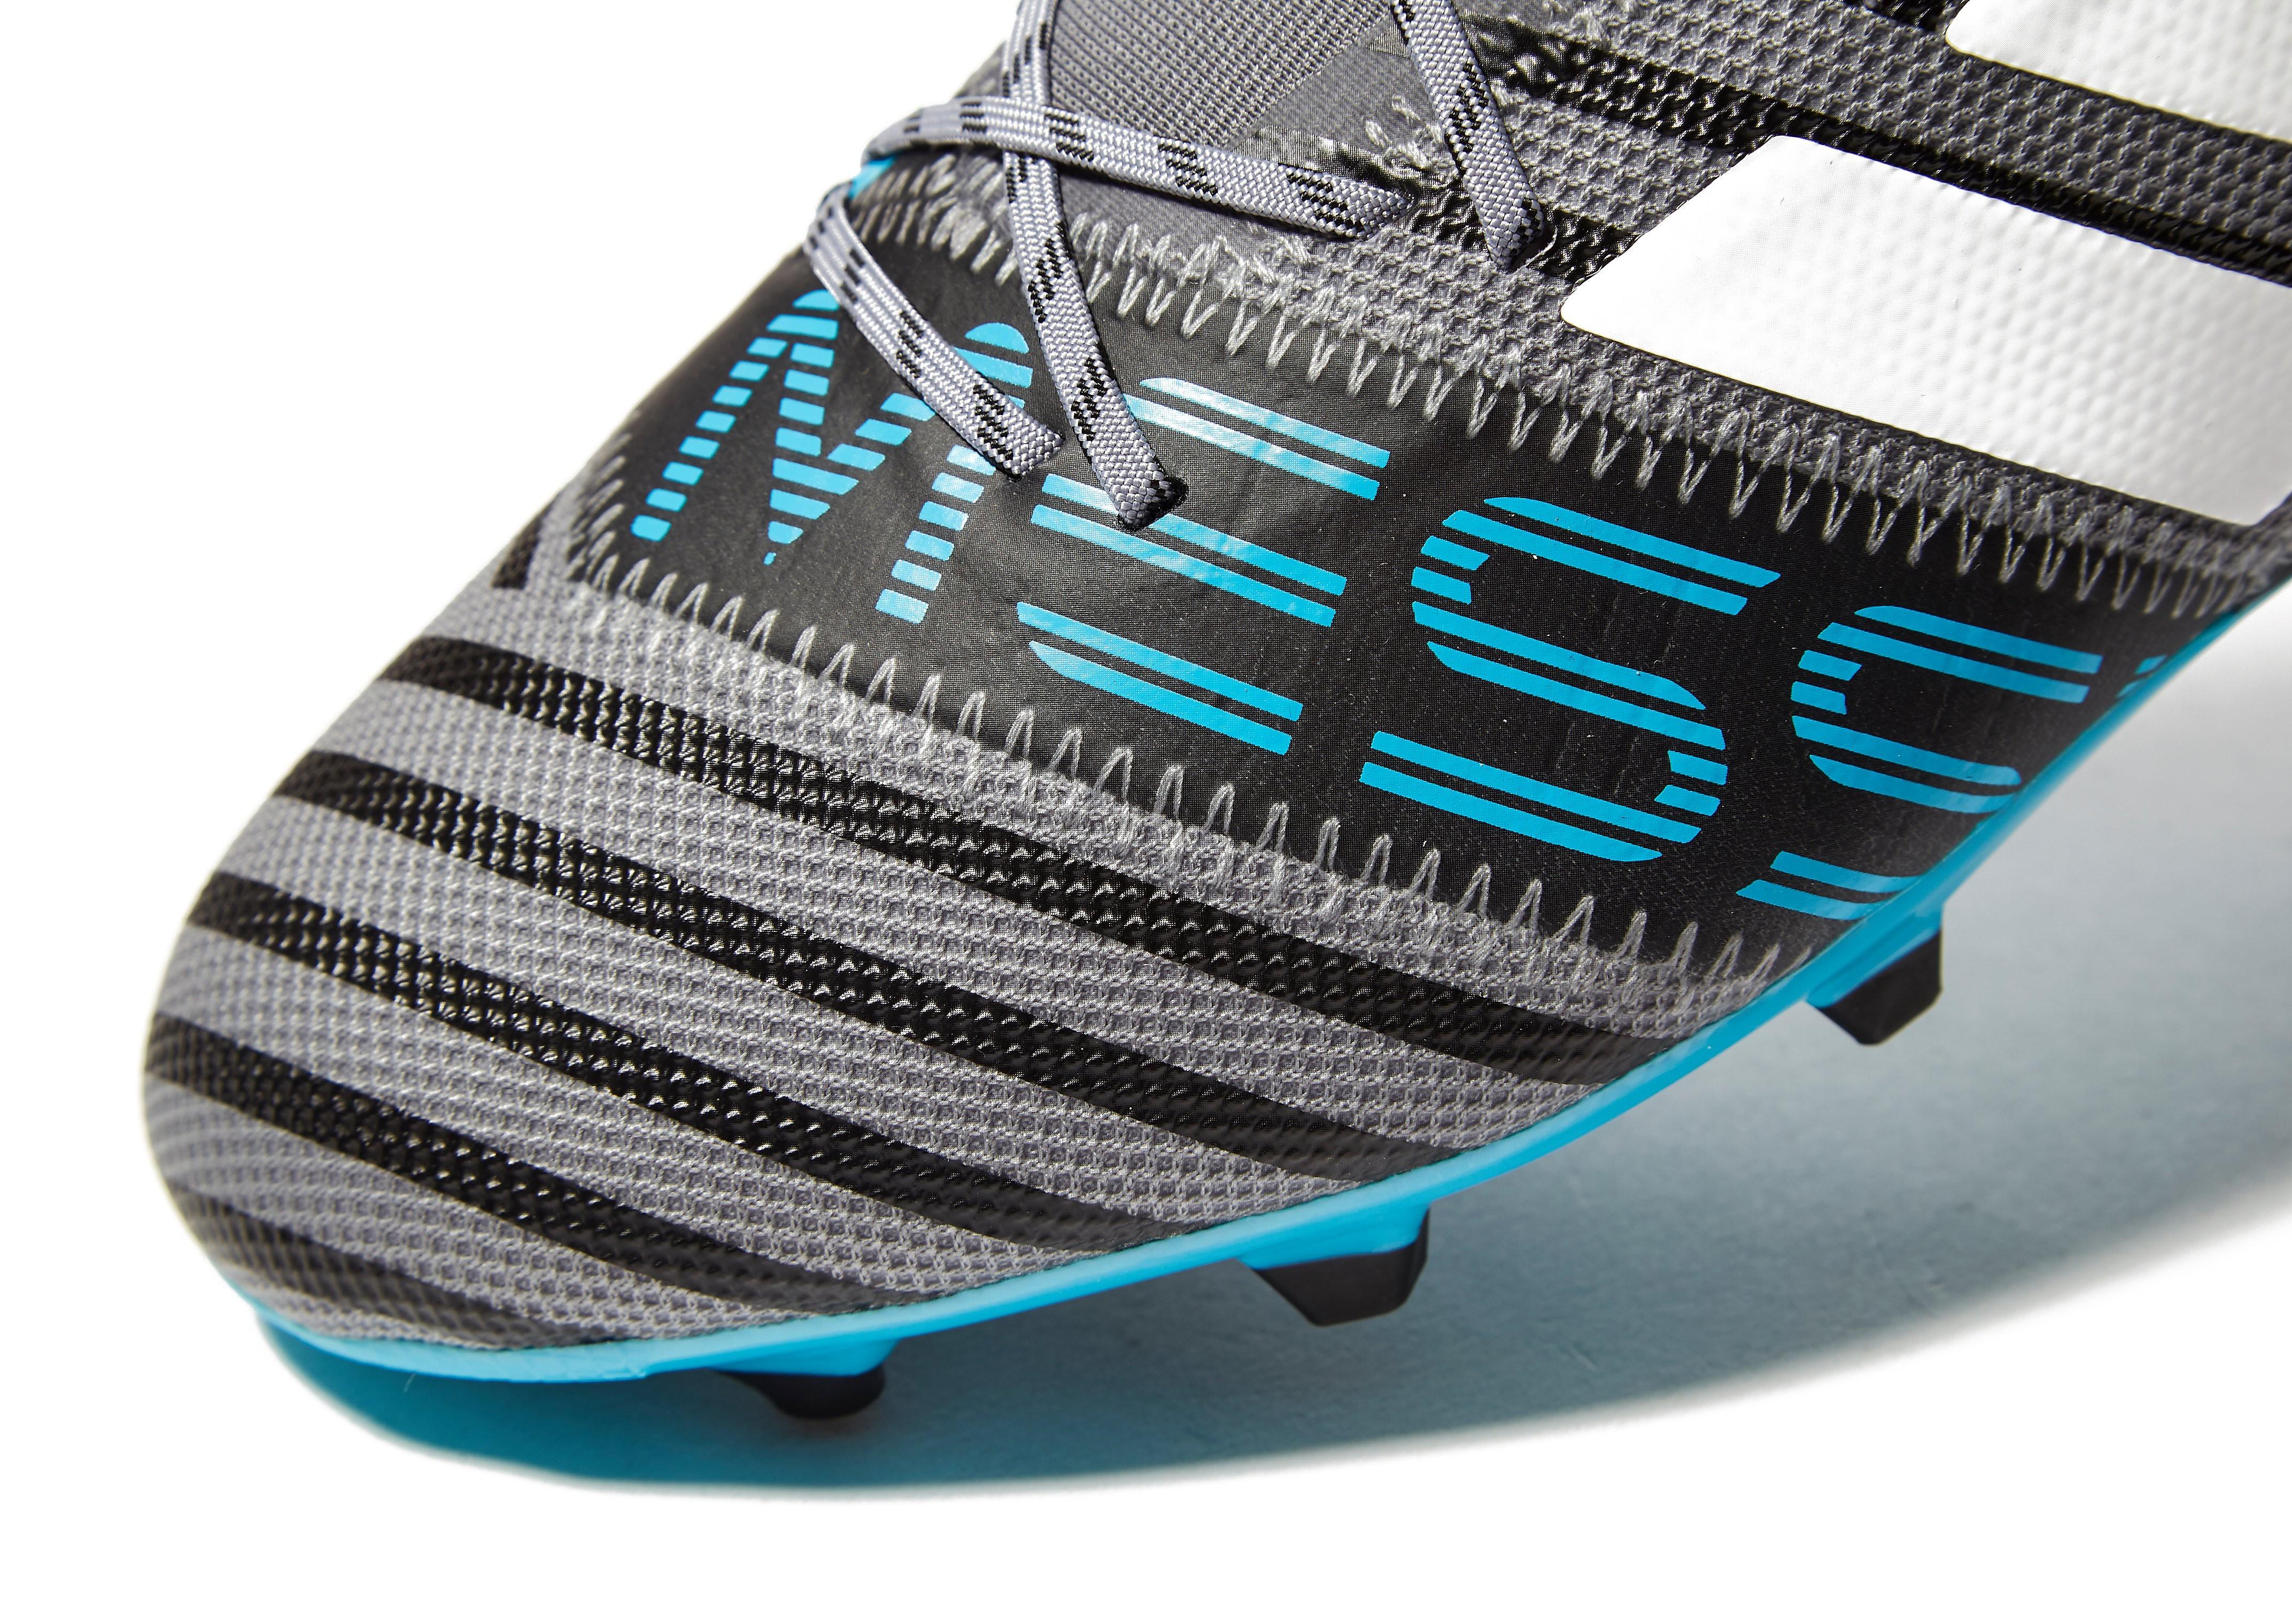 adidas Cold Blooded Nemeziz Messi 17.2 FG